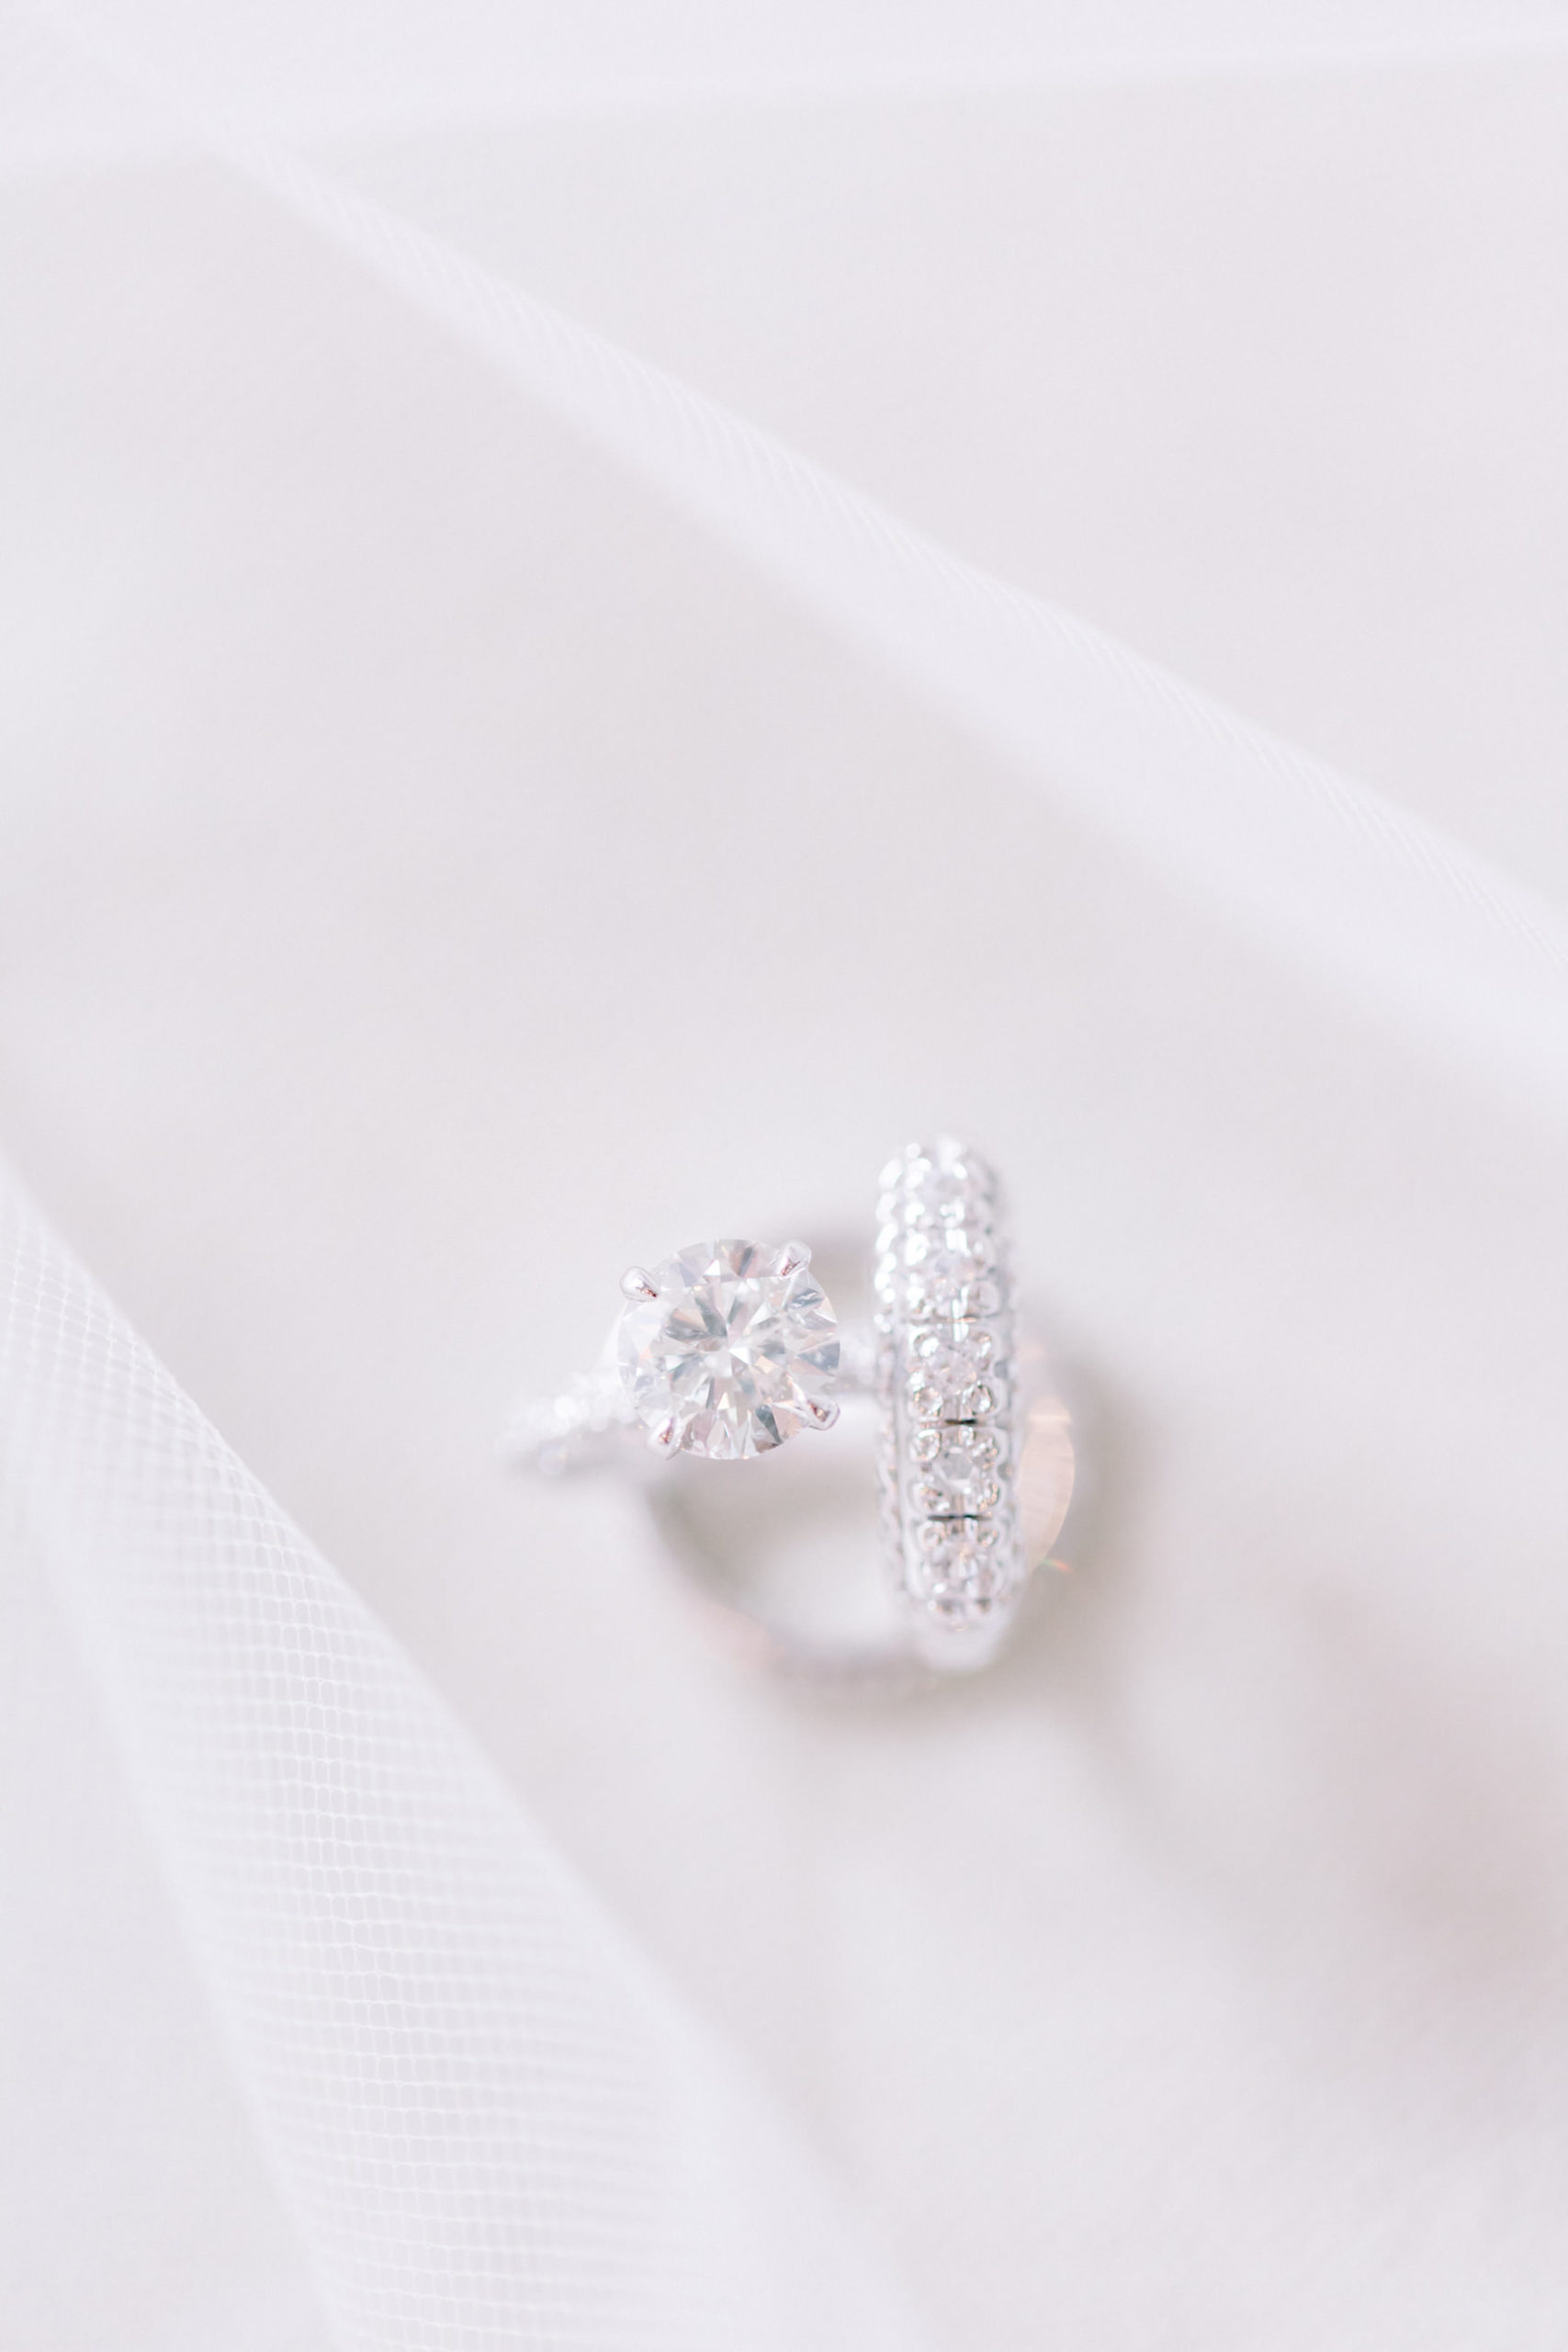 Diamond Solitaire Engagement Ring and Diamond Tampa Bride Wedding Band | Tampa Wedding Photographer Shauna and Jordon Photography